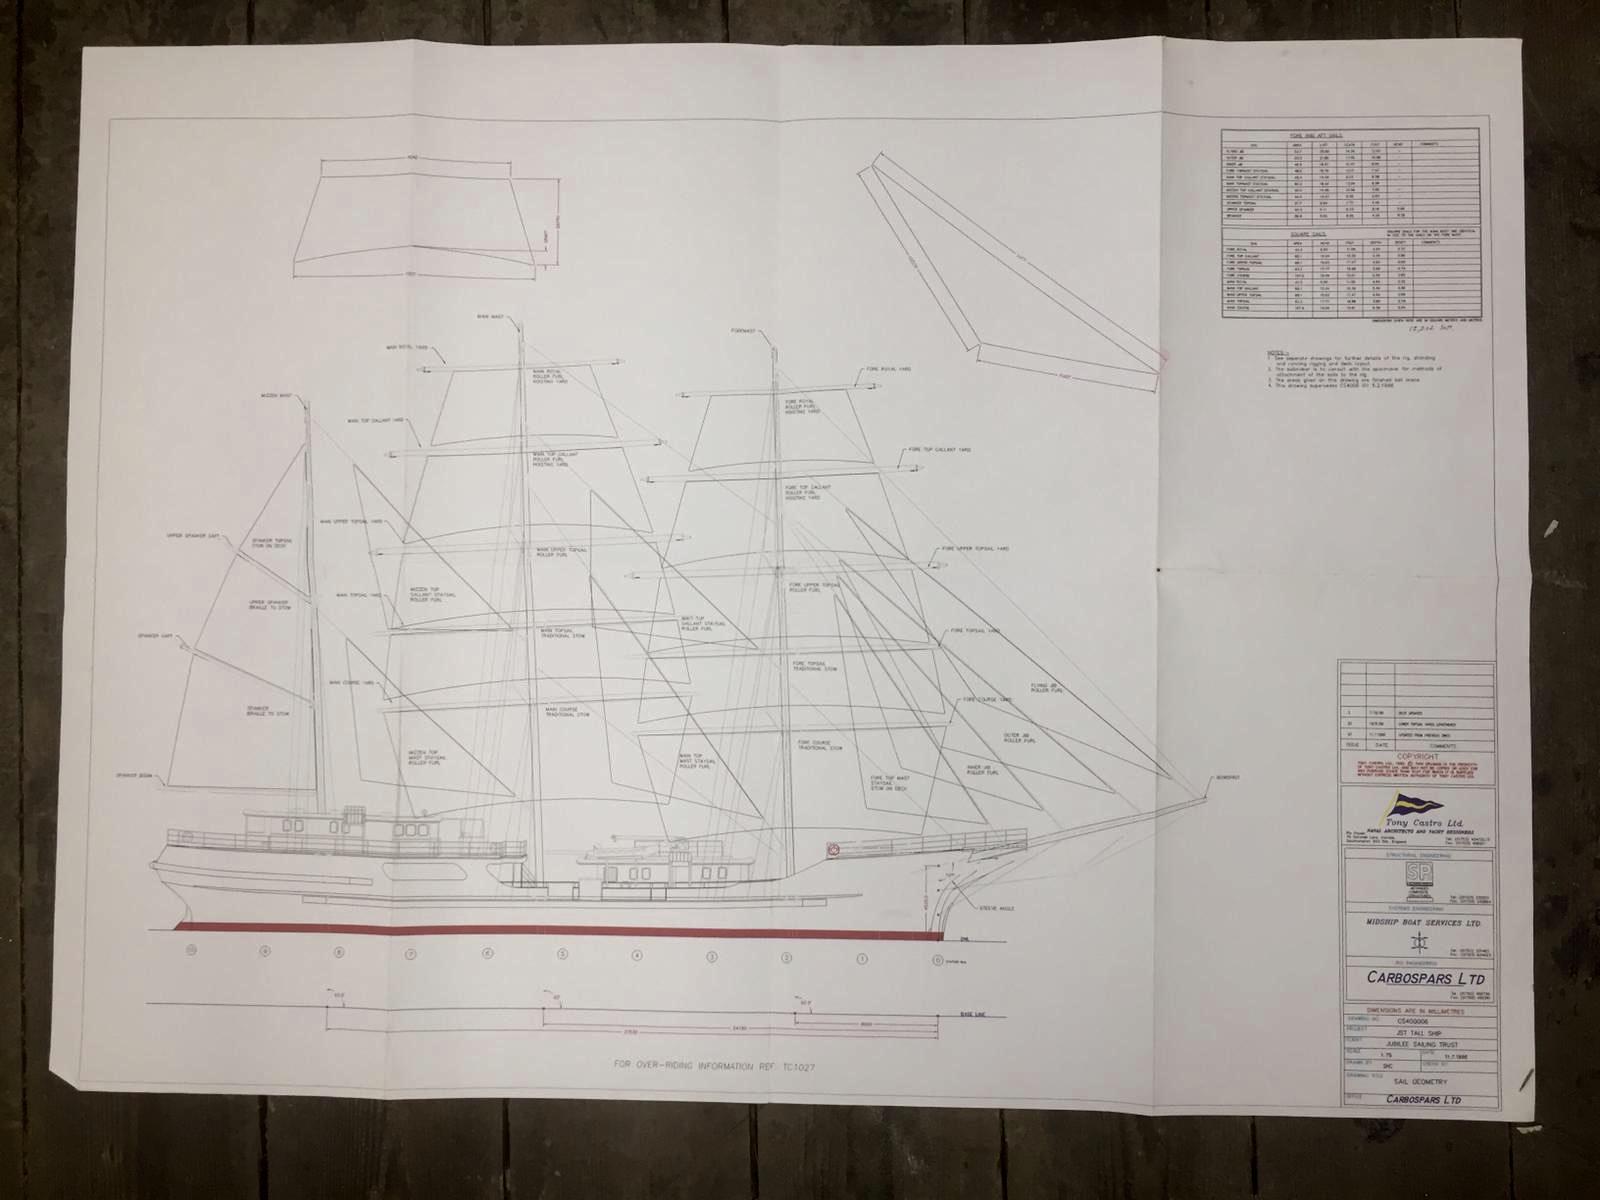 Jubilee Sailing Trust Sail Plan.jpg